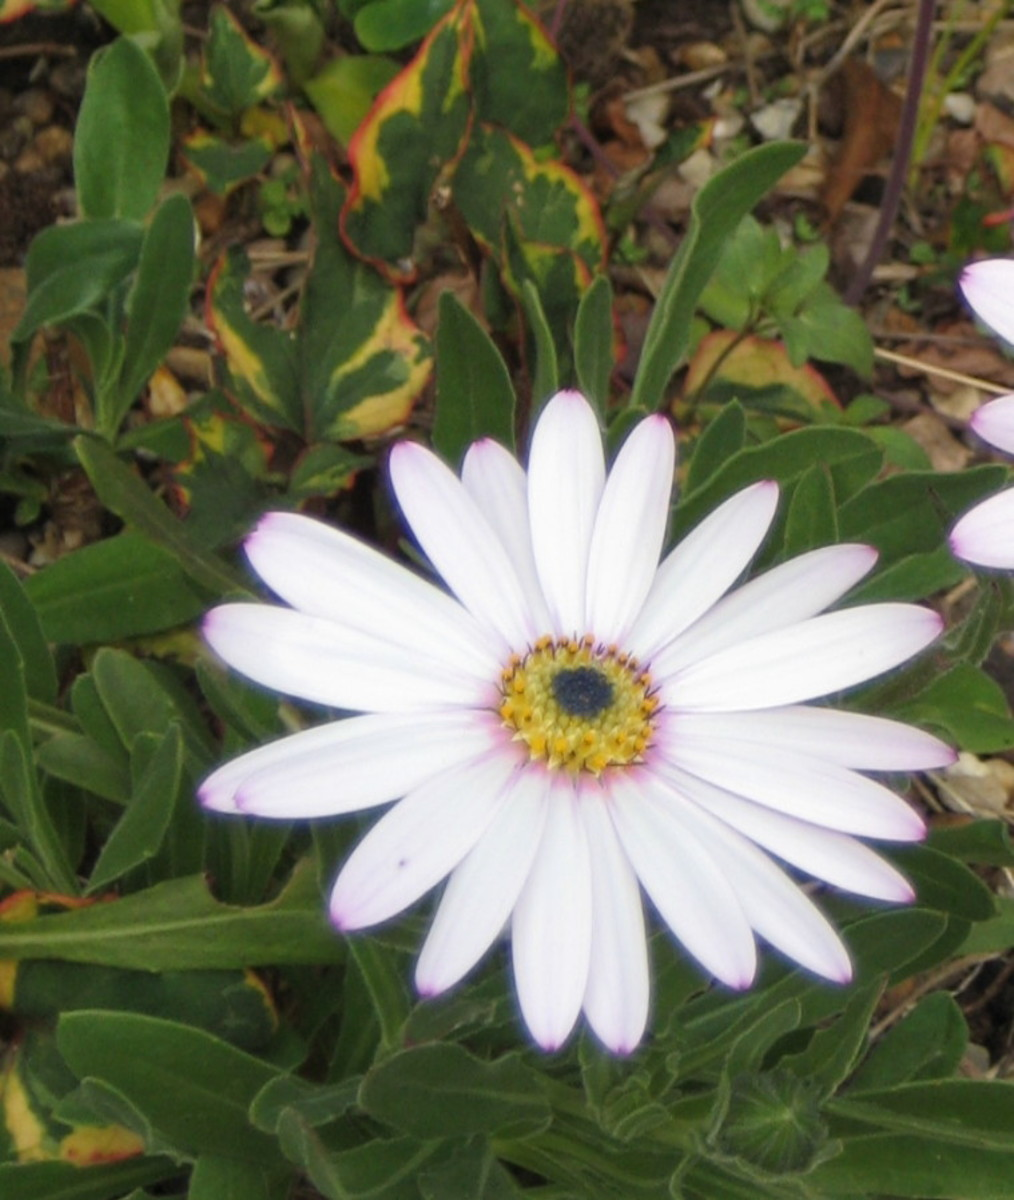 Photo: Osteospermum flower also called cape daisy.